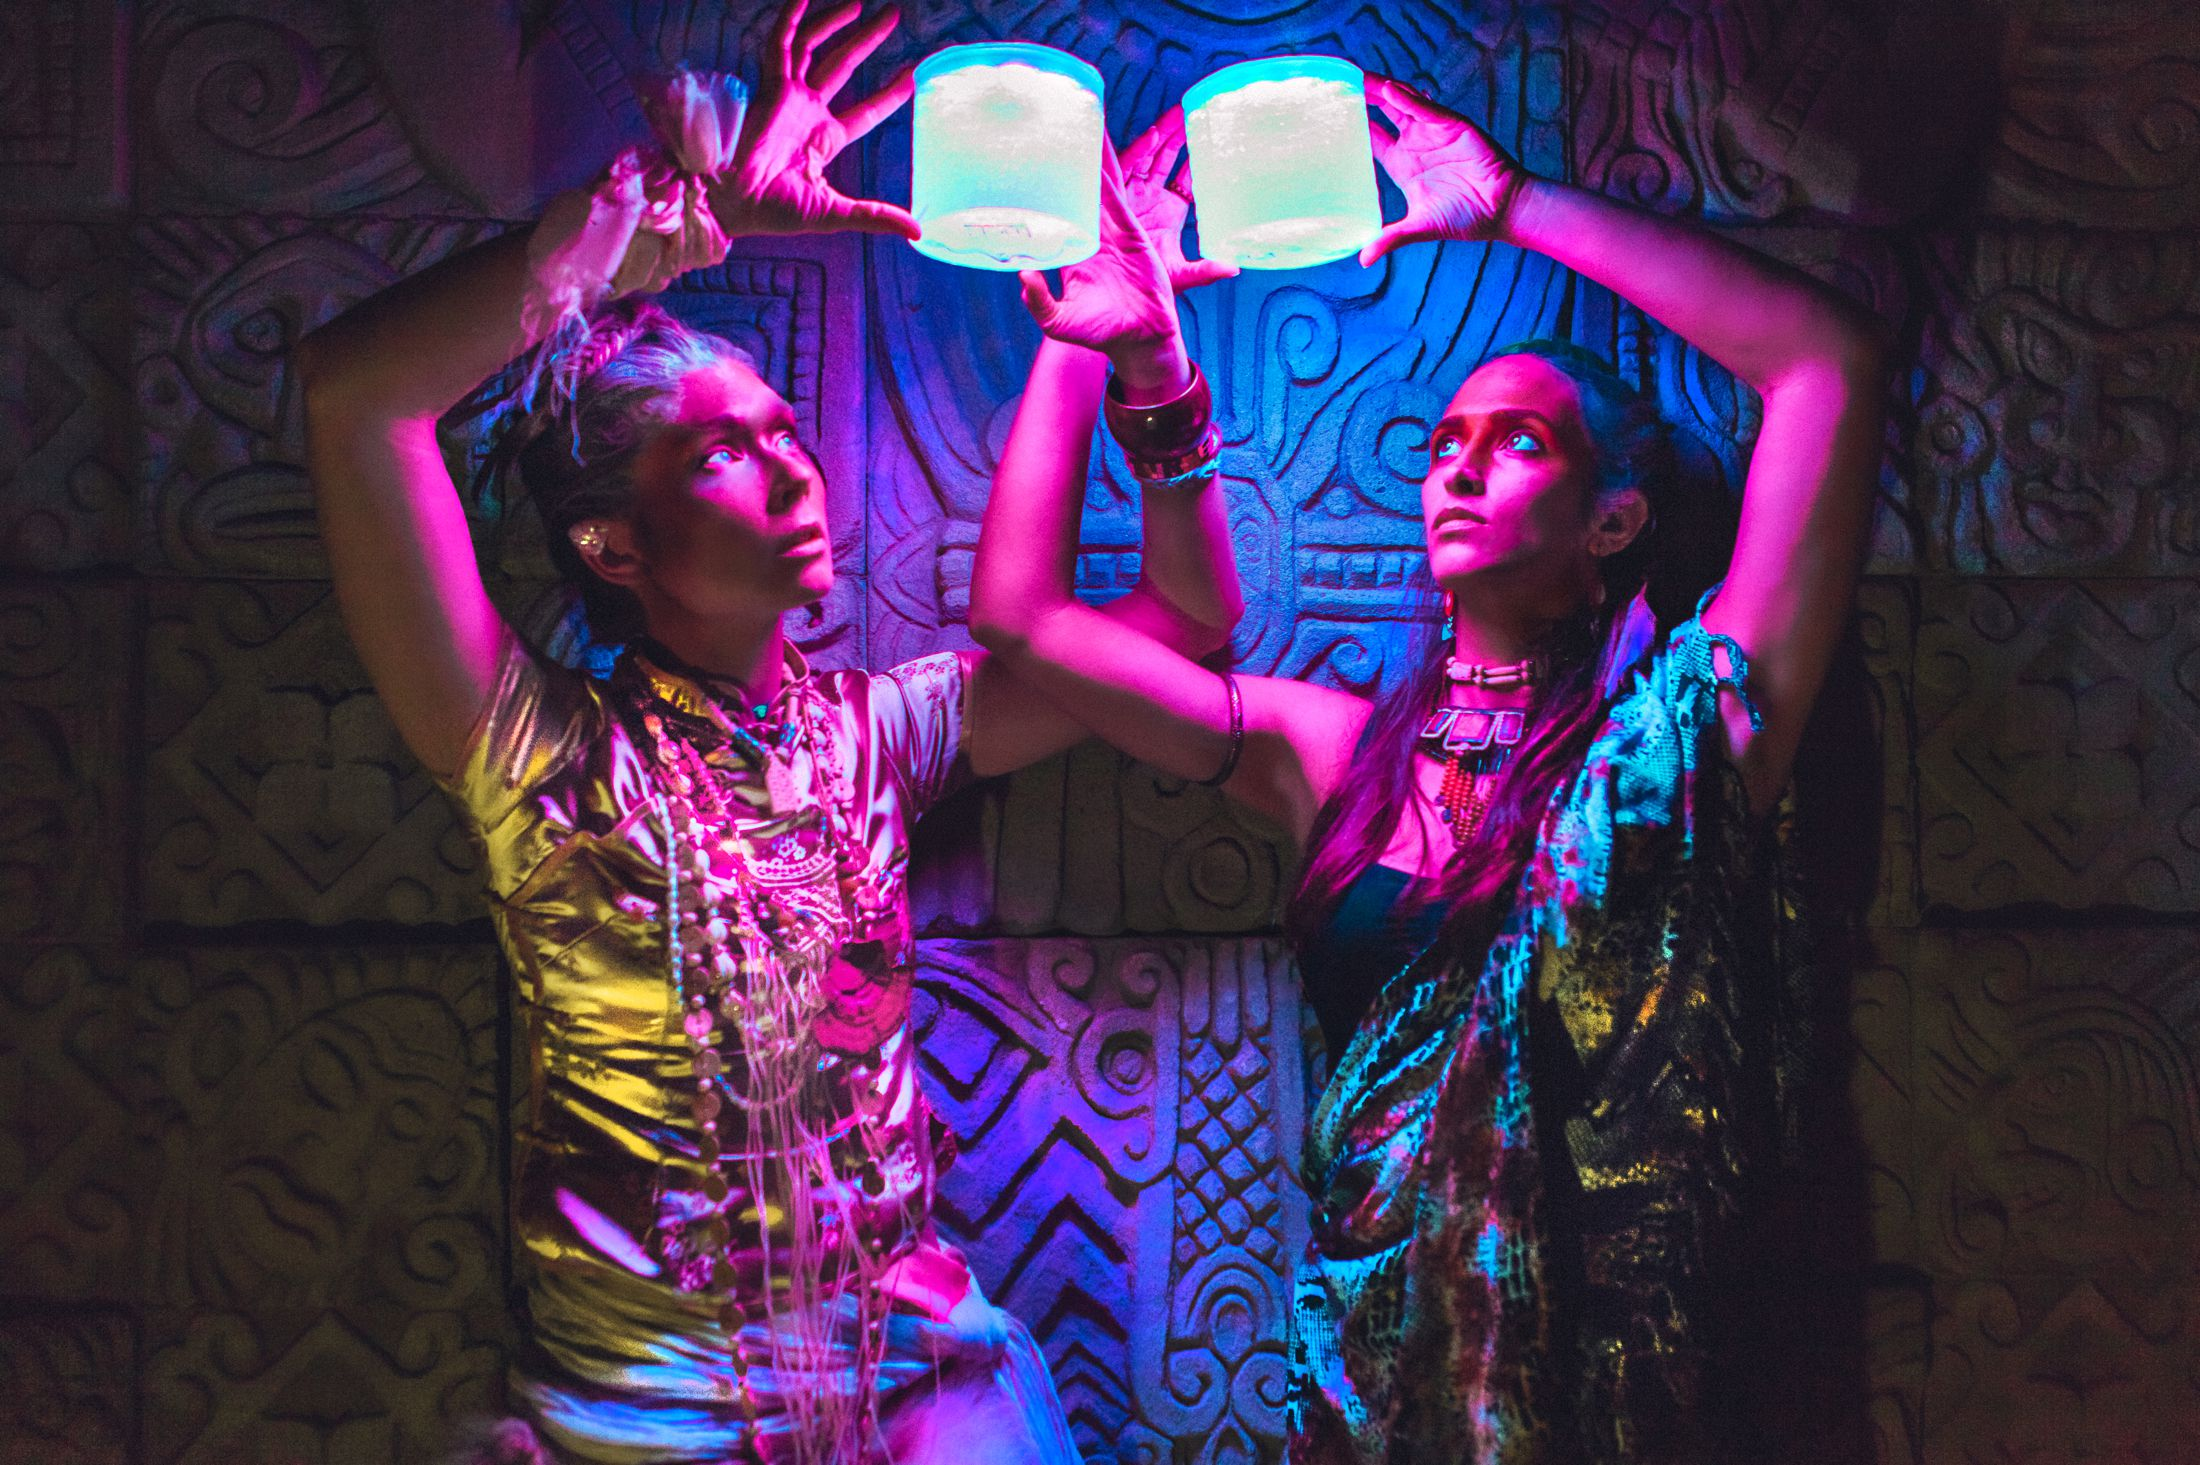 Electric Forest yoga LED light nomad festival style ethnic global fashion shoot warpaint tribal 10.jpg